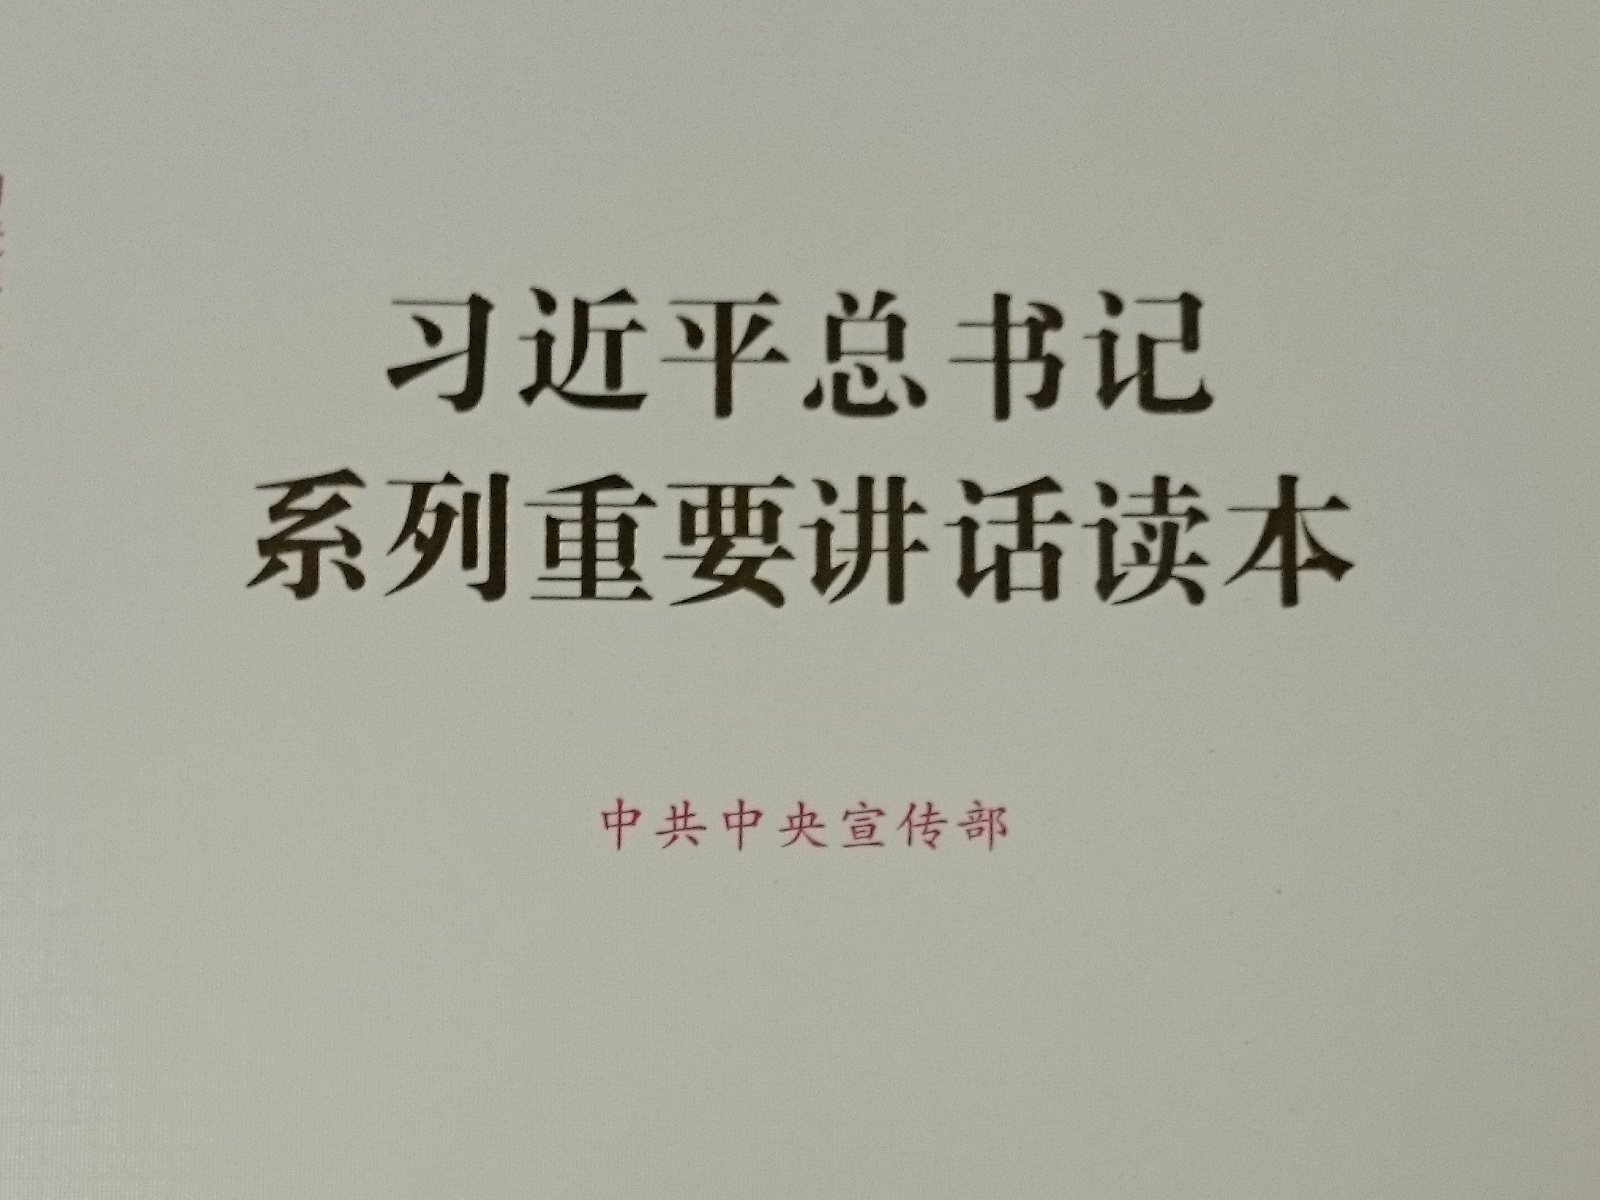 General Secretary Xi Jinping important speech series